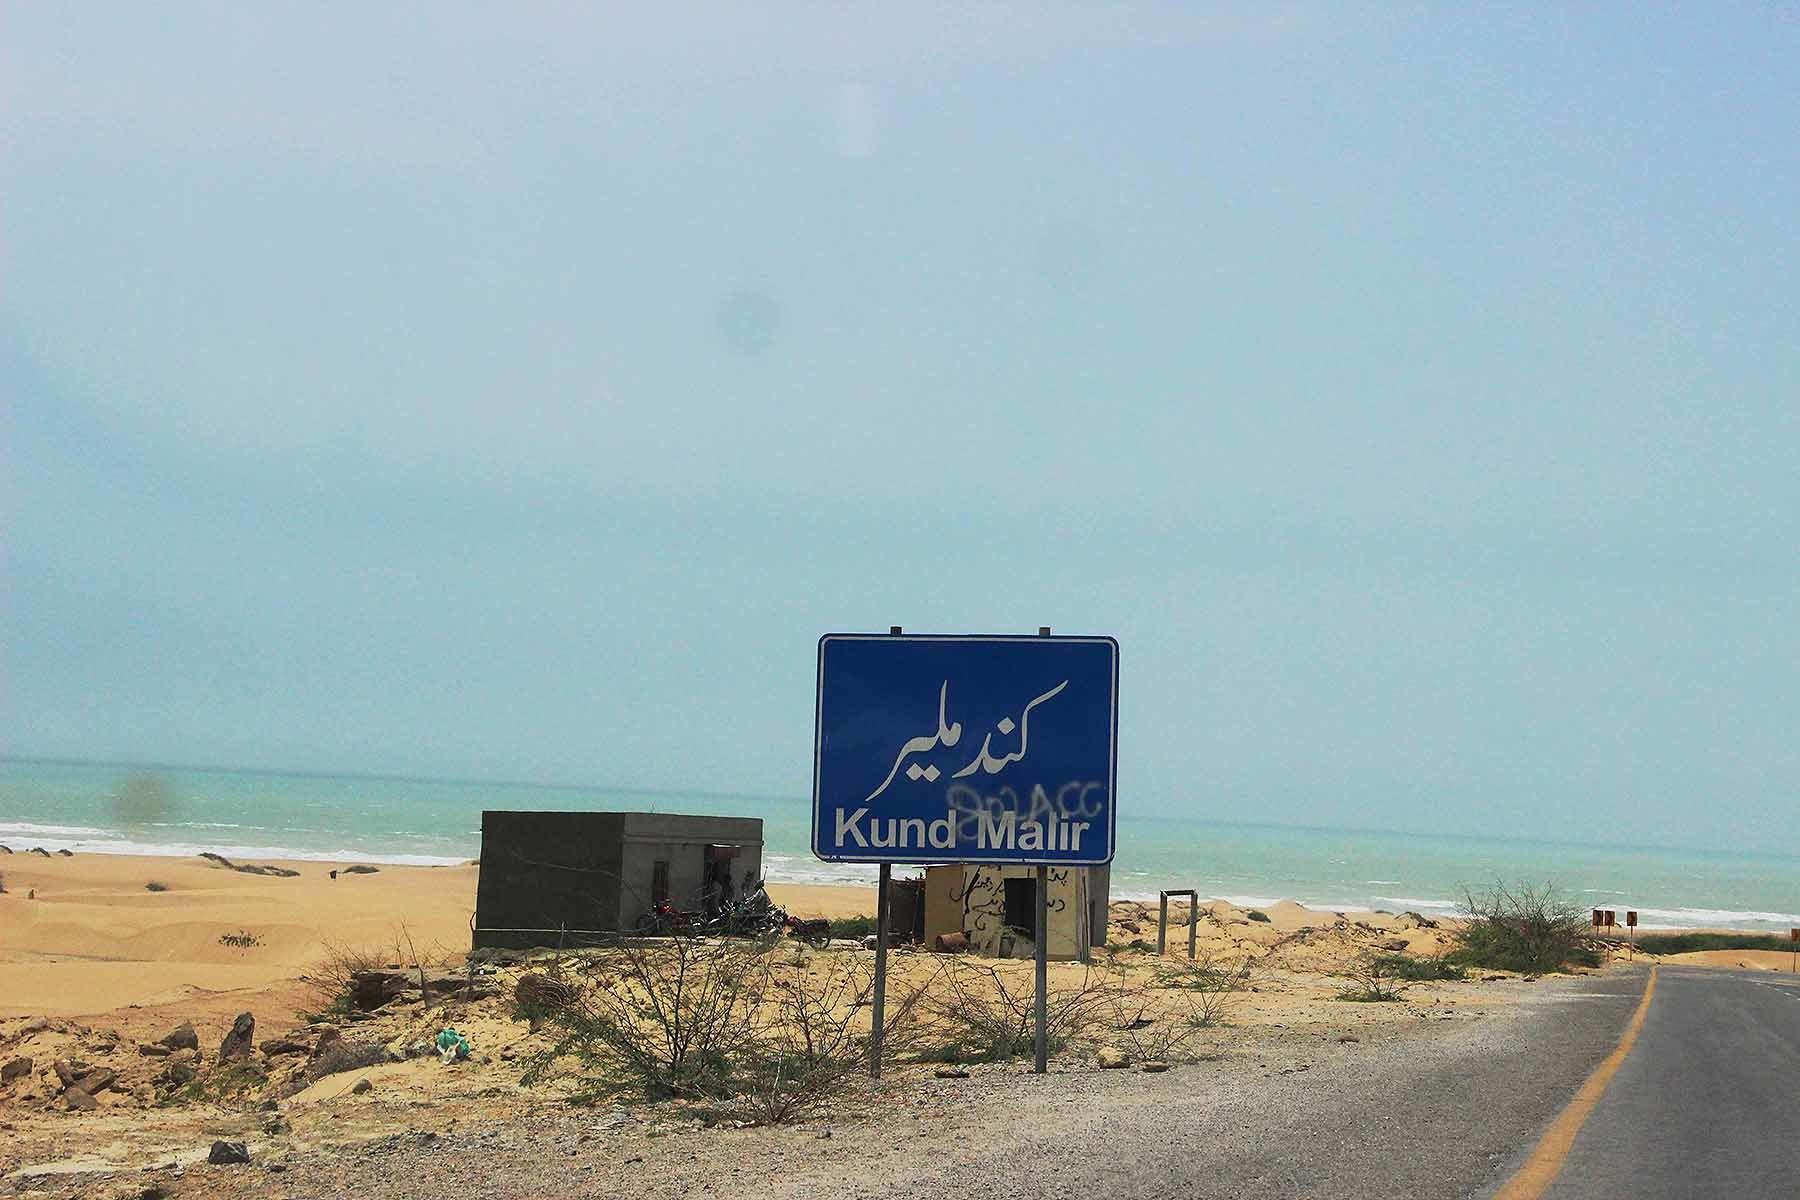 Signboard displaying the start of Kund Malir Beach.